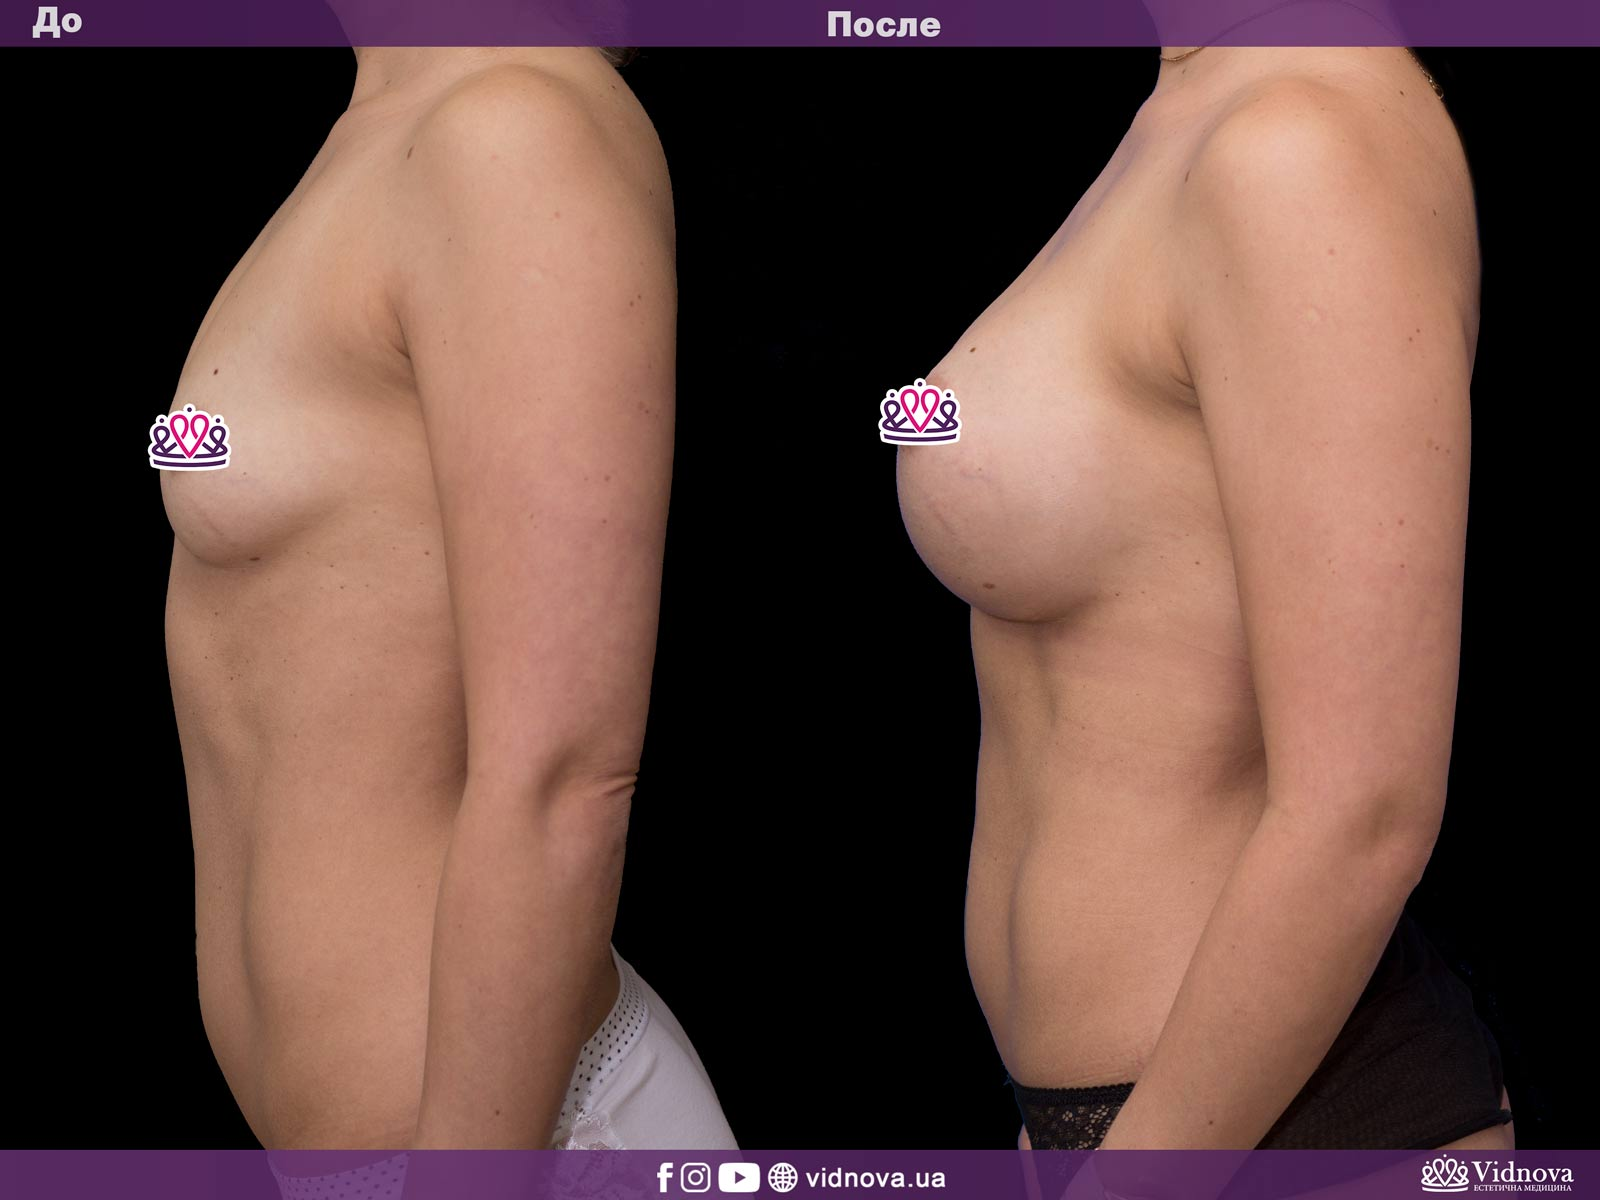 Увеличение груди: Фото ДО и ПОСЛЕ - Пример №39-3 - Клиника Vidnova